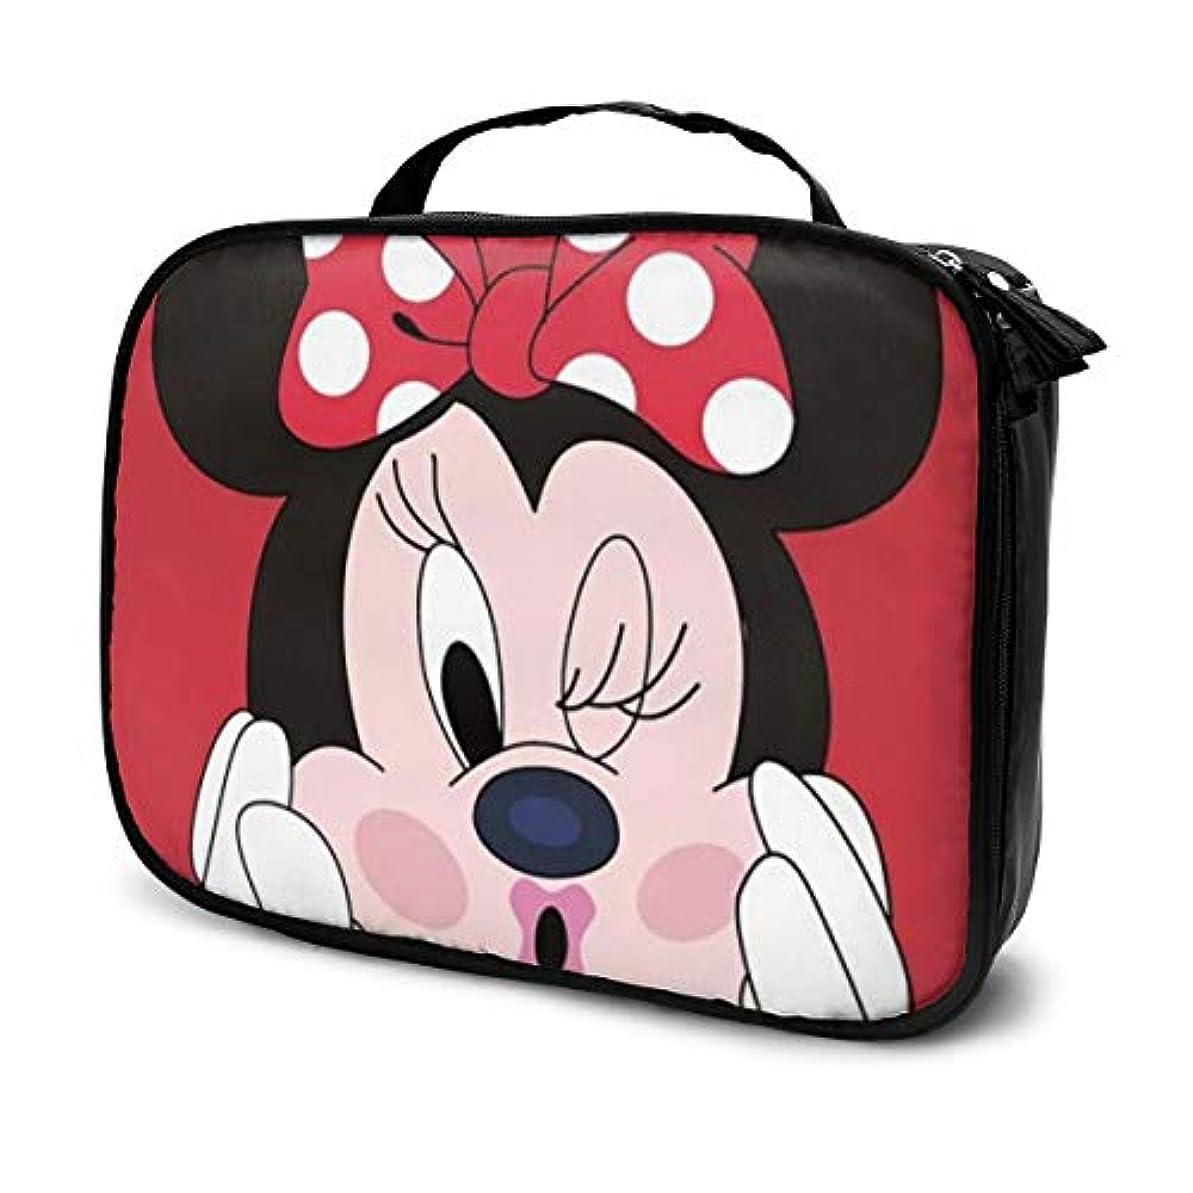 Daituラッキーミニー 化粧品袋の女性旅行バッグ収納大容量防水アクセサリー旅行